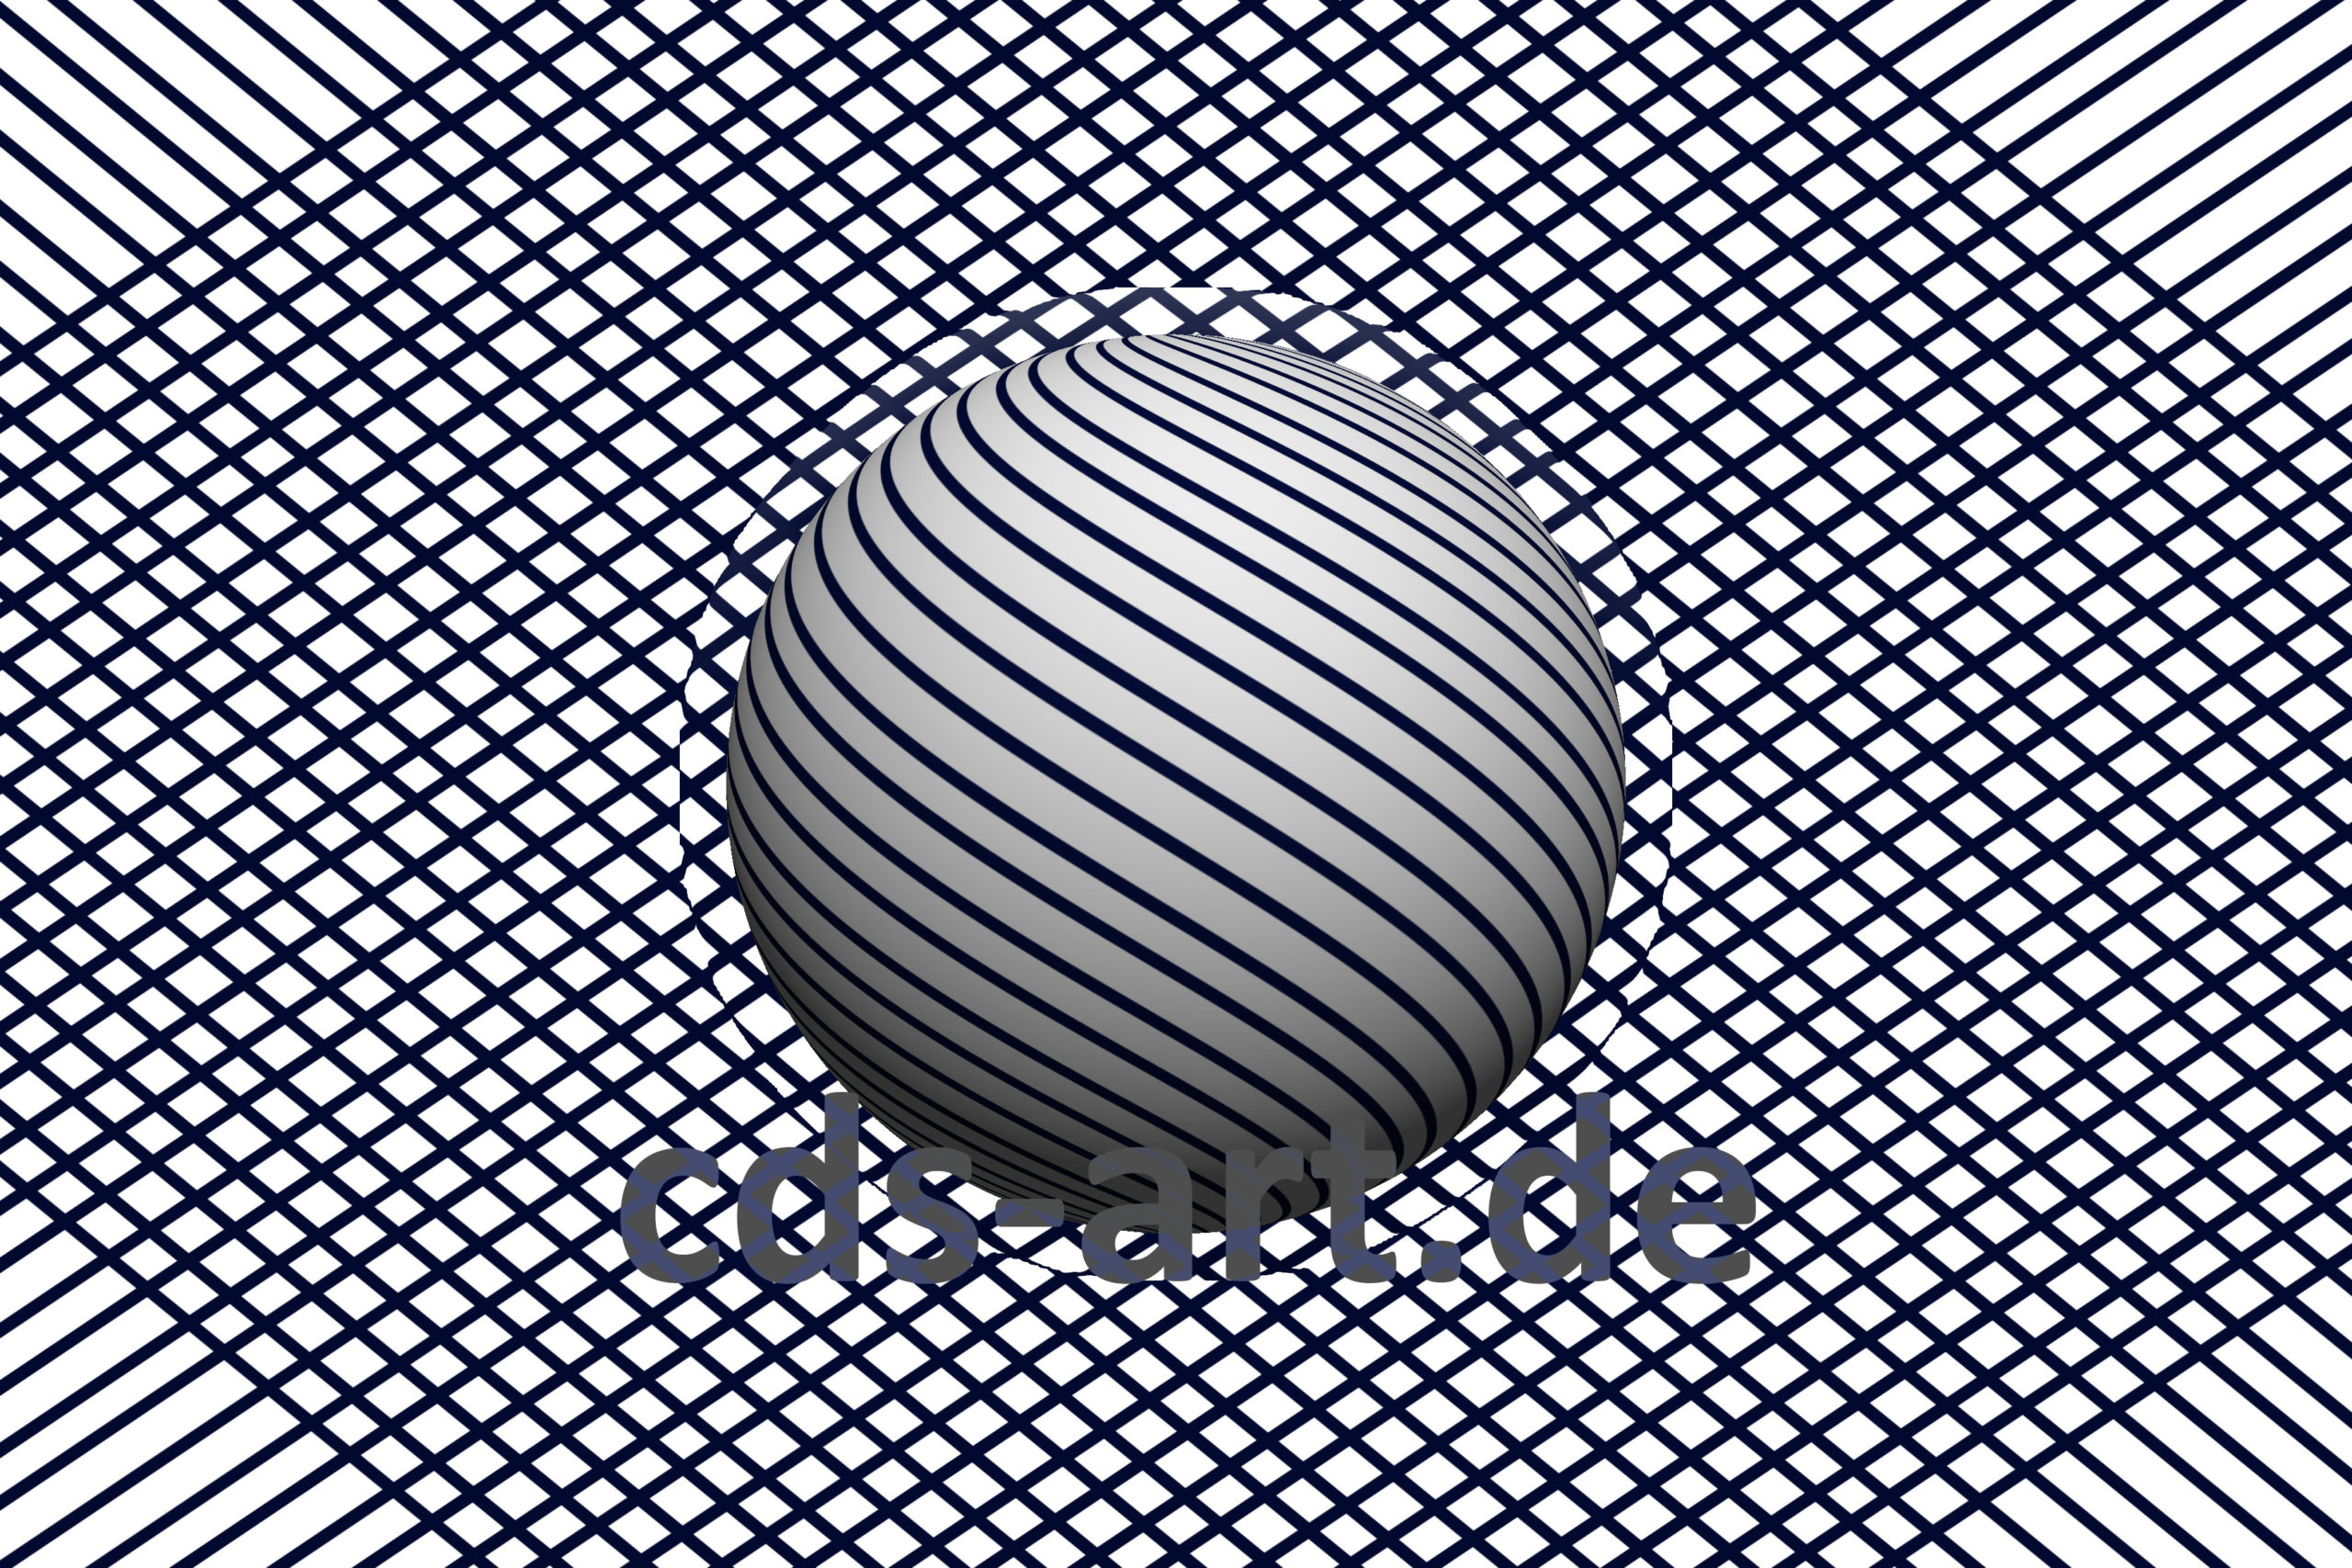 Ball confusion